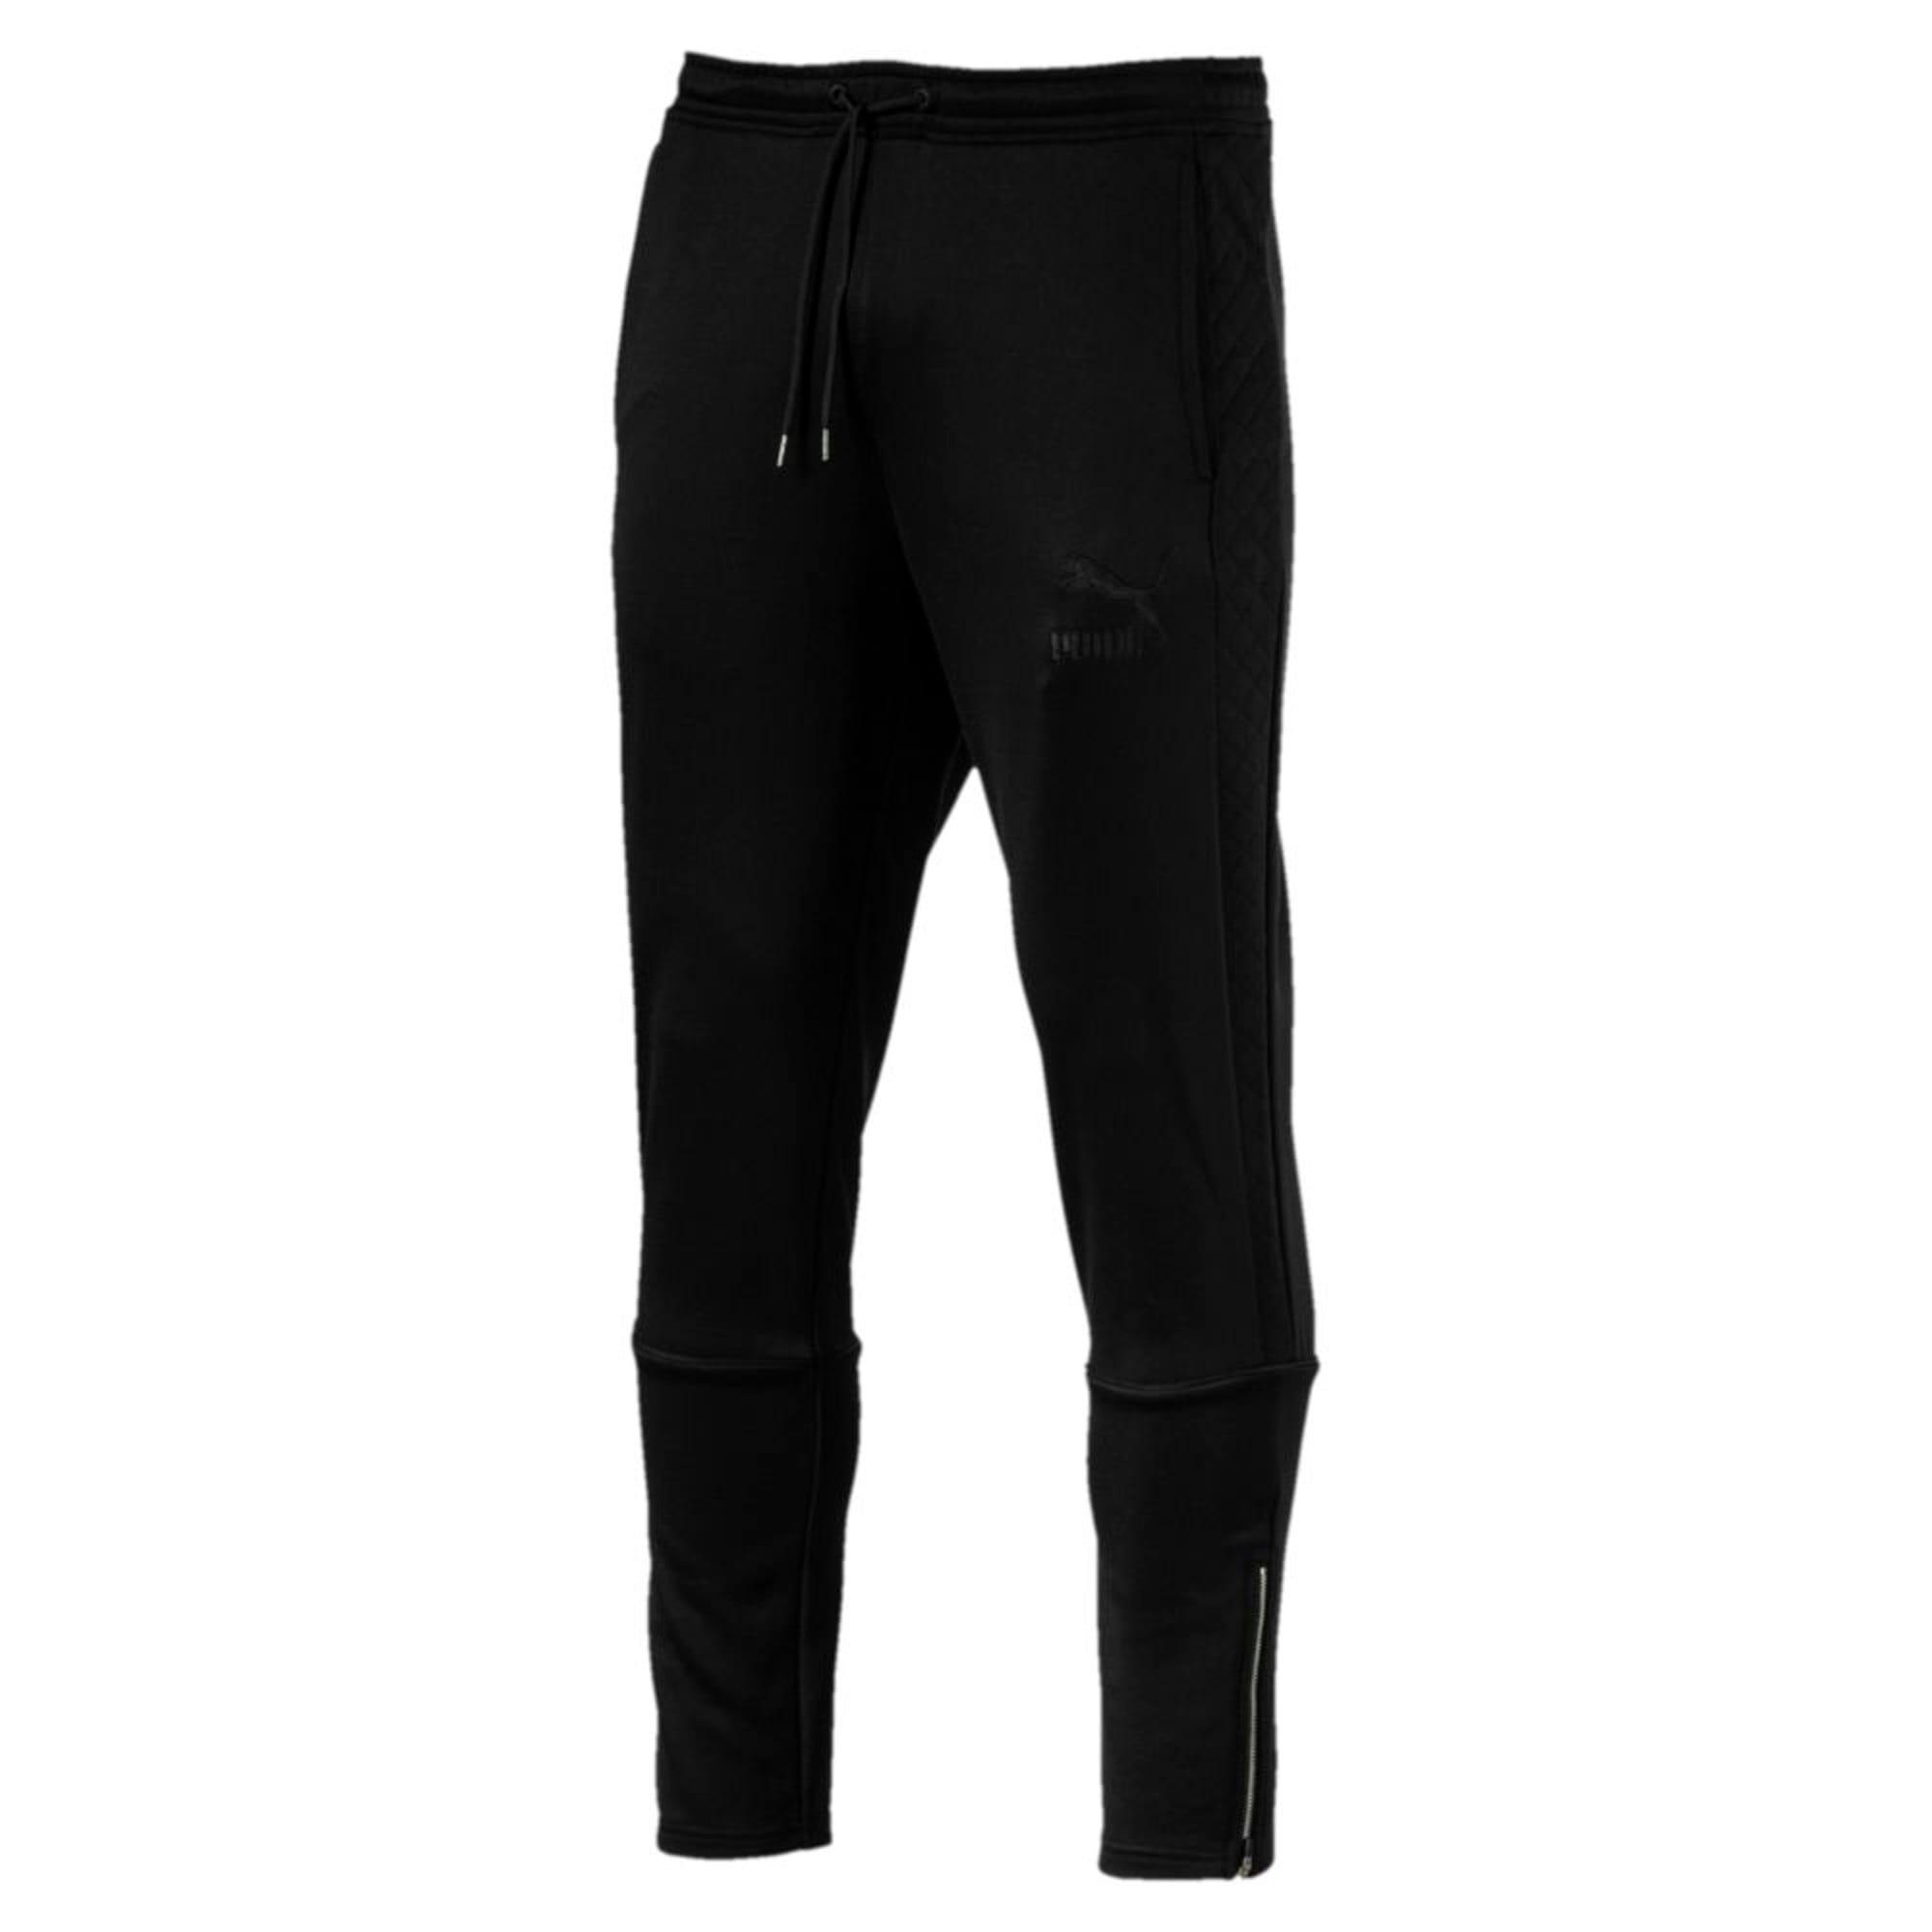 Thumbnail 3 of Archive Retro Quilted Men's Sweatpants, Puma Black, medium-IND